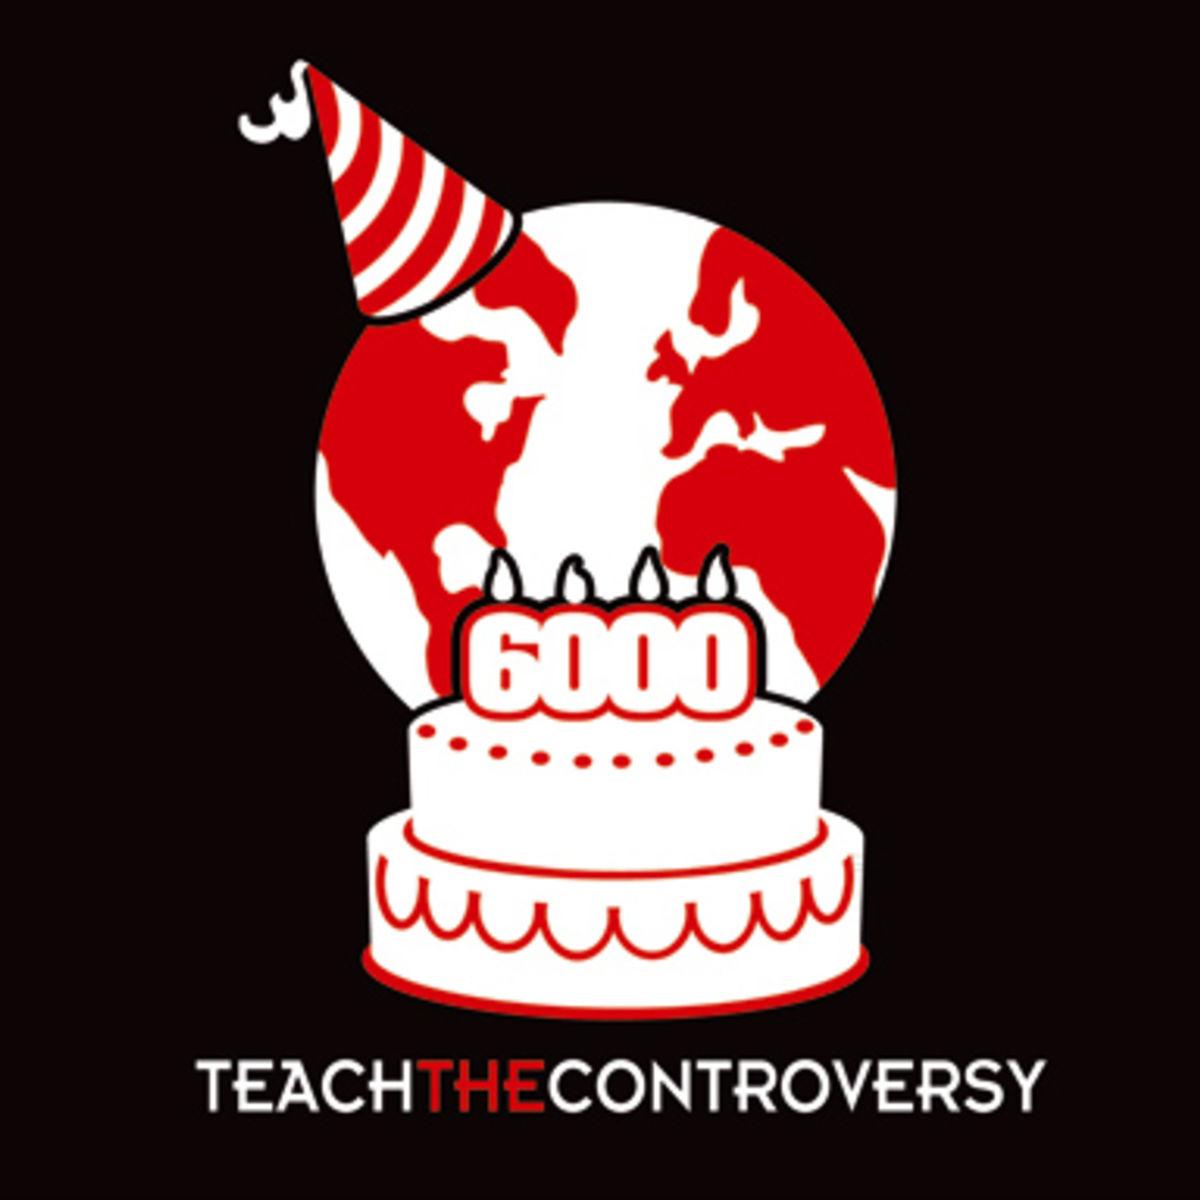 teachcontroversy_creationism.jpg